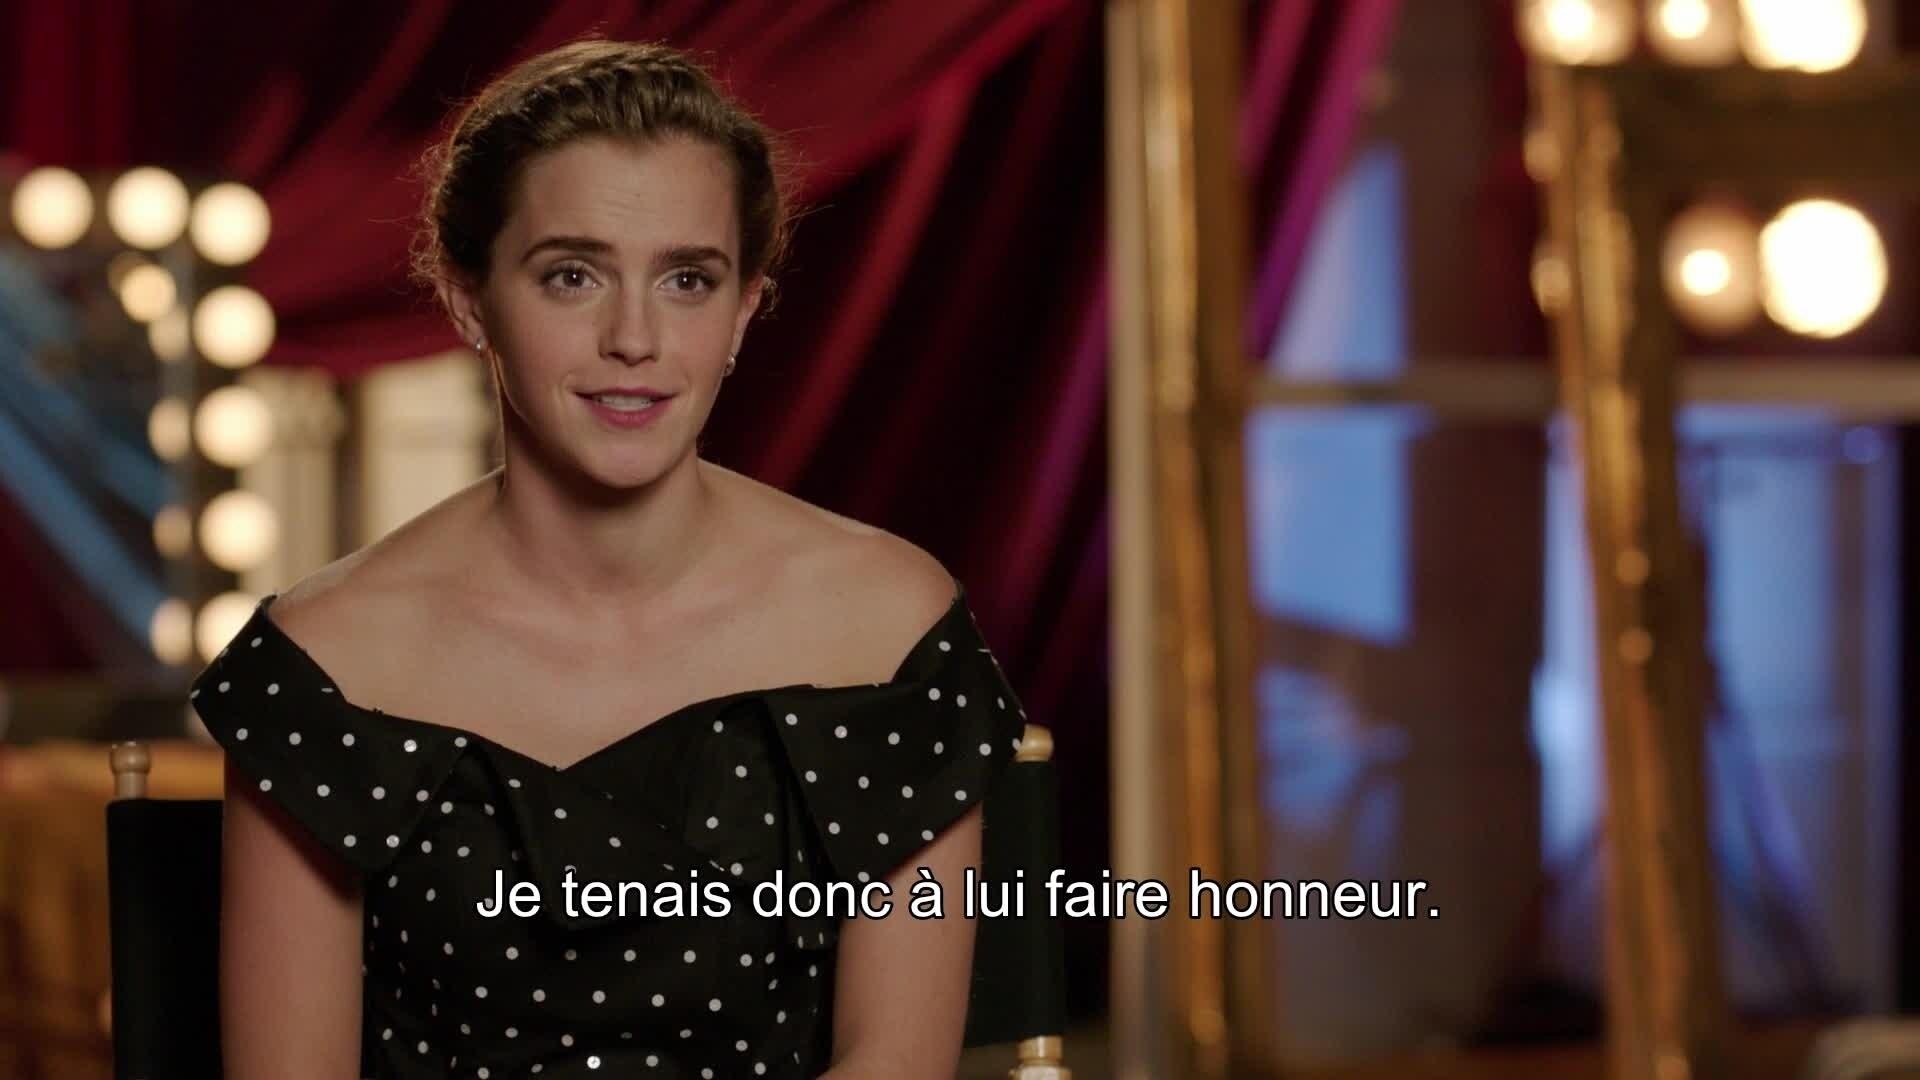 La Belle et la Bête (2017) - Reportage : Belle, héroïne moderne